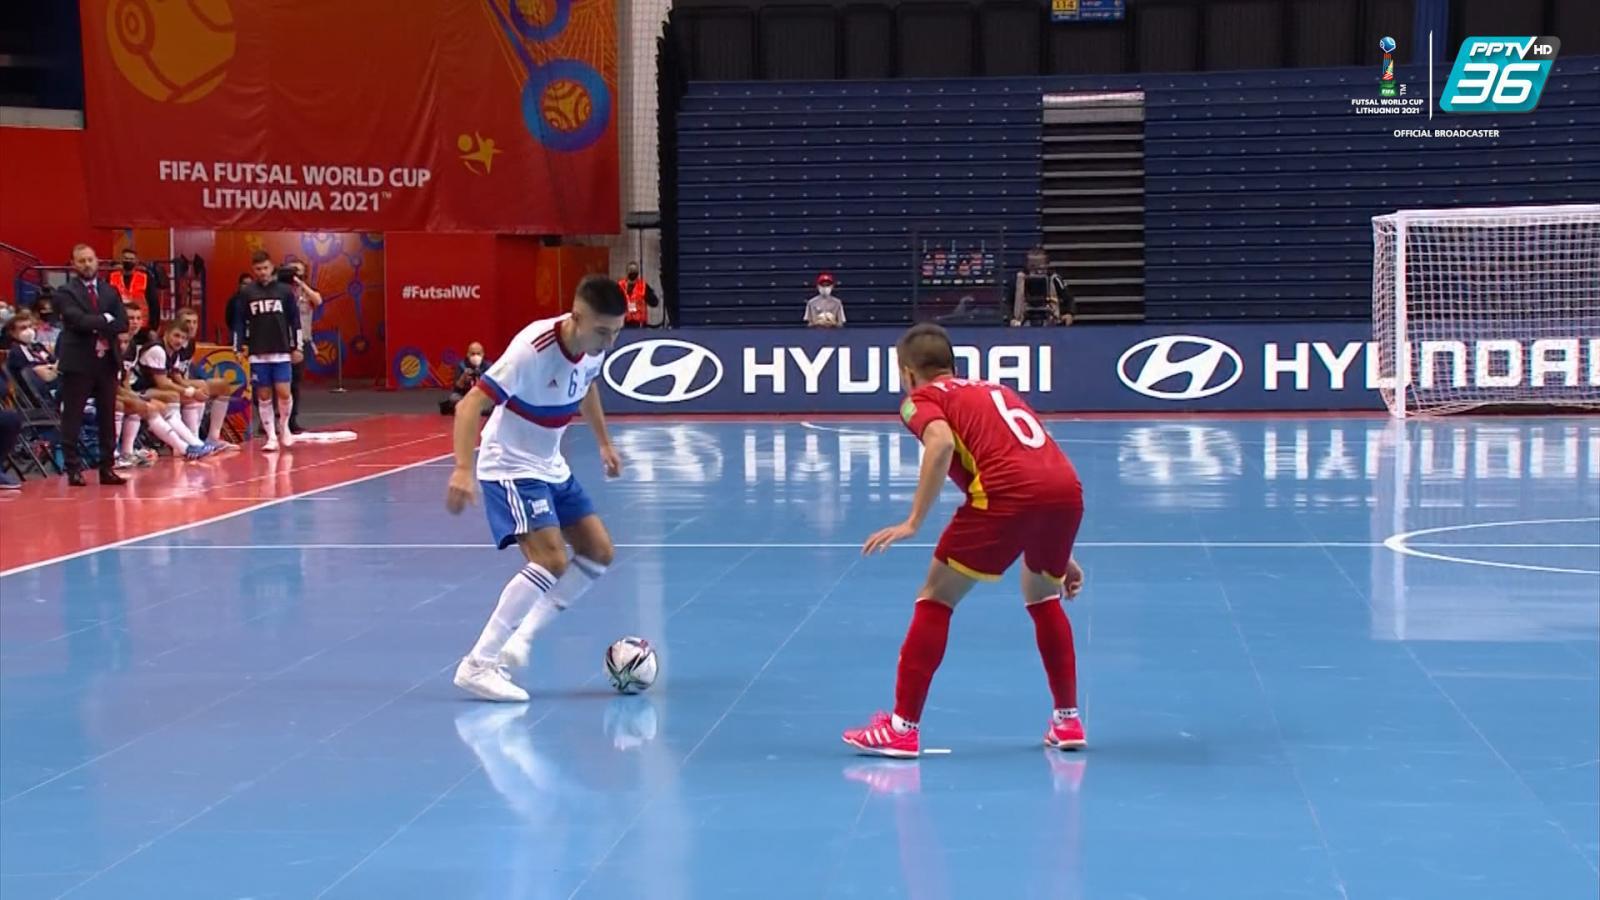 Full Match | ฟีฟ่า ฟุตซอล เวิลด์ คัพ 2021 | รัสเซีย พบ เวียดนาม | 22 ก.ย. 64